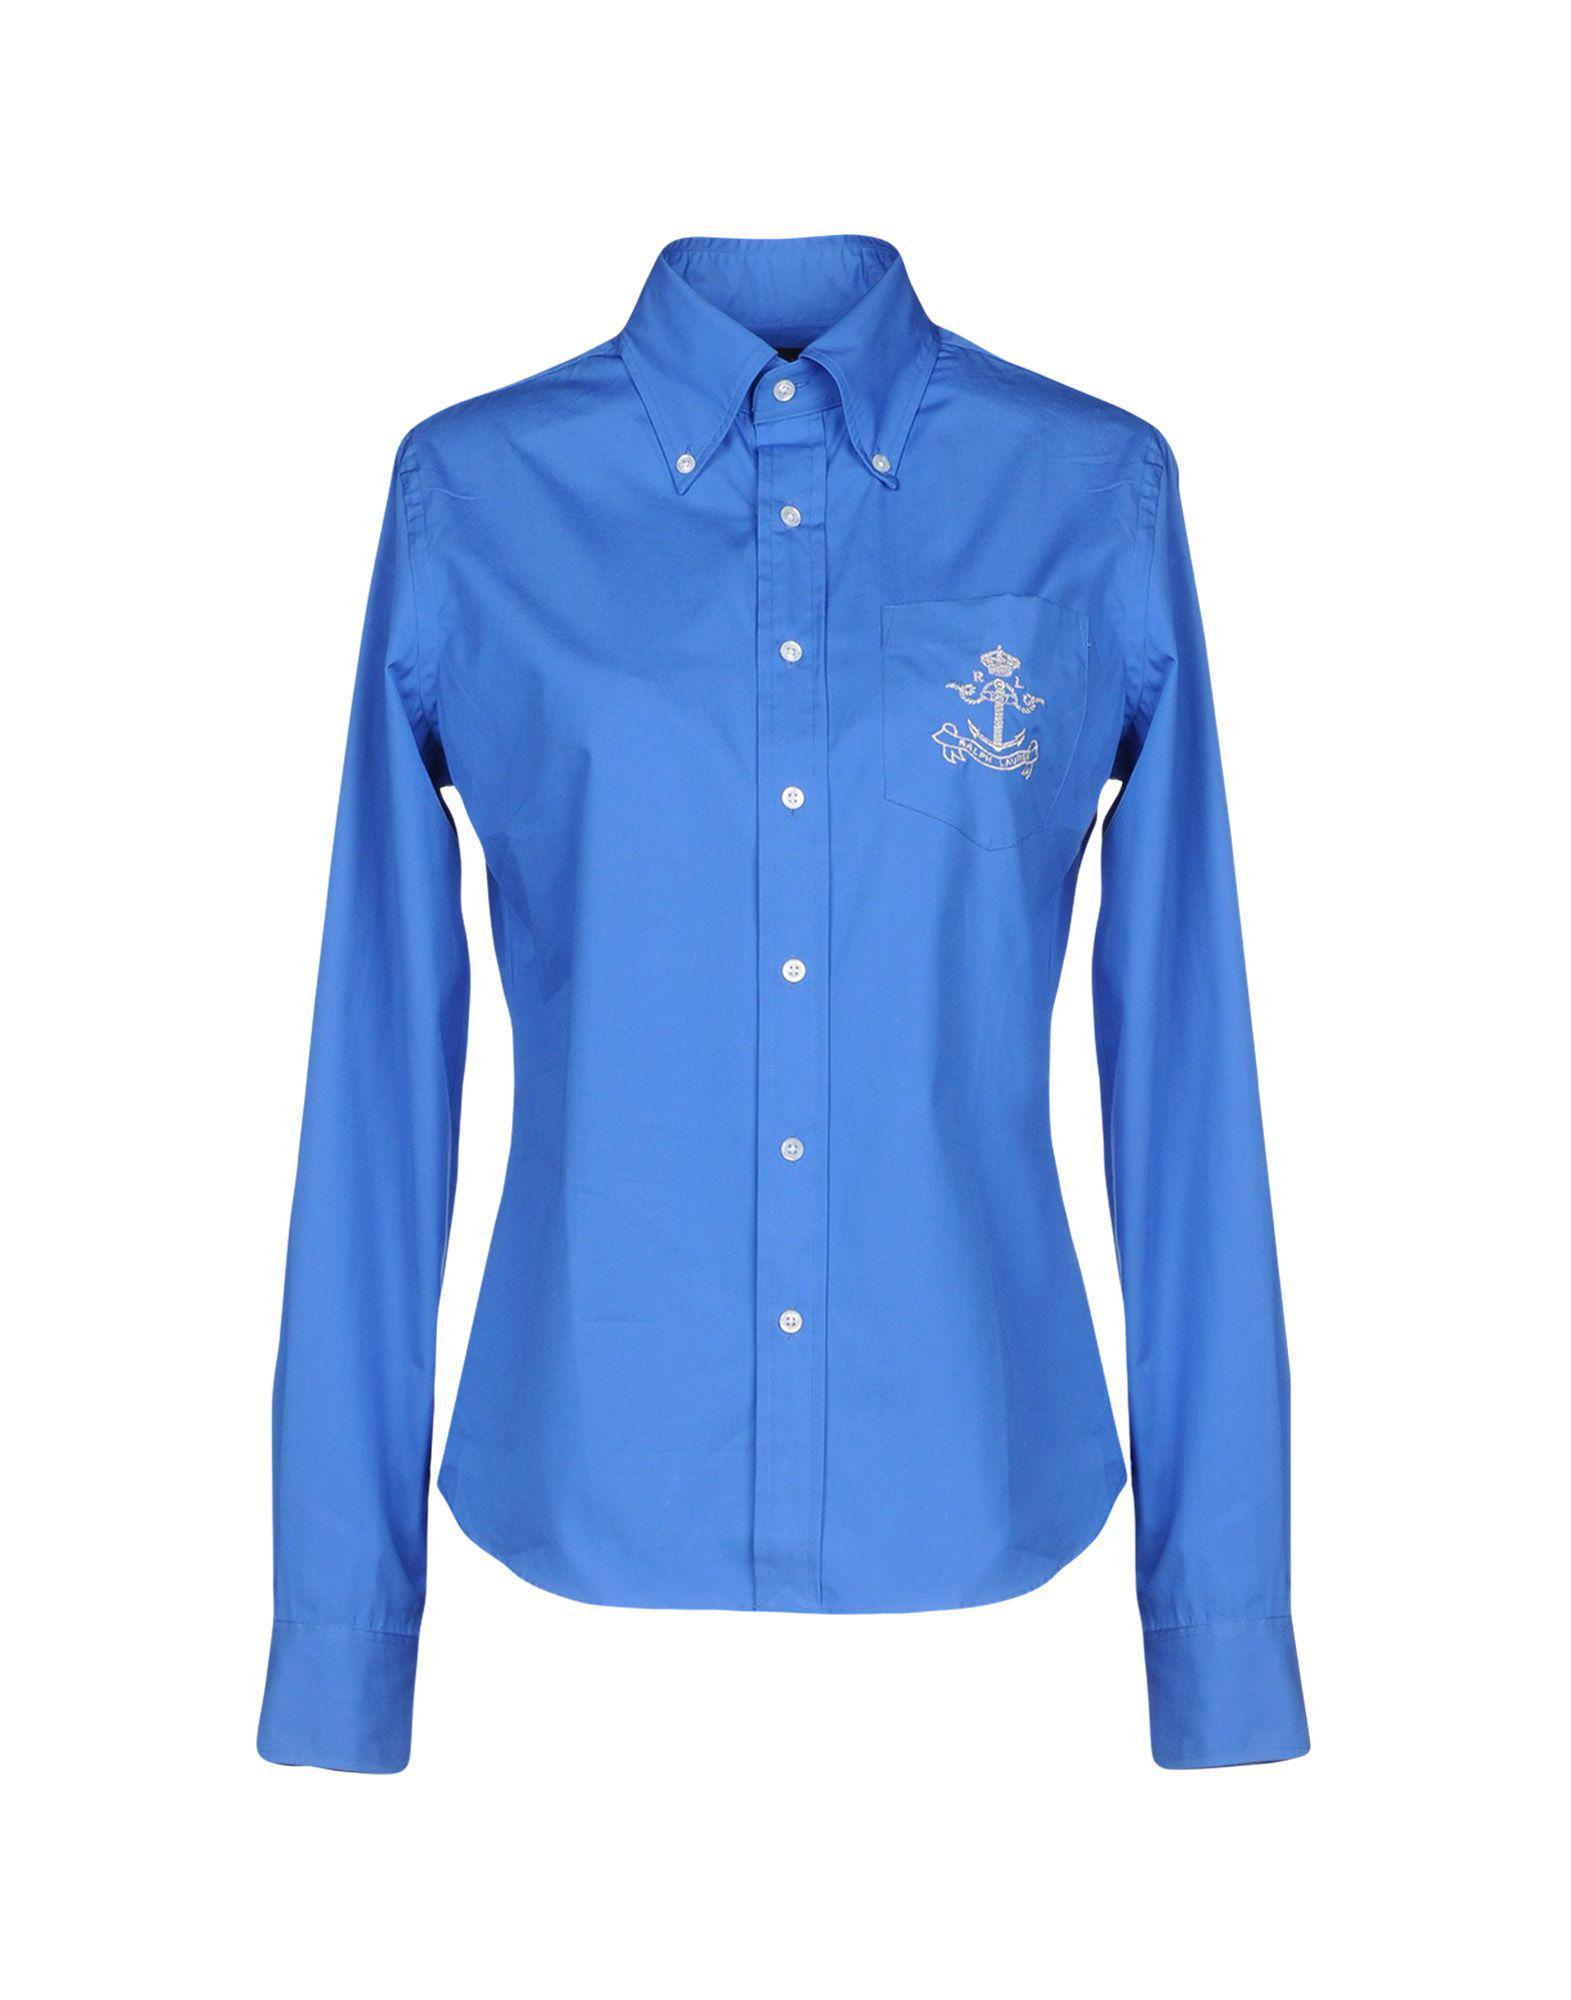 9eaa5dbb9b1e0 Ralph Lauren Black Label. Camisa de mujer de color azul